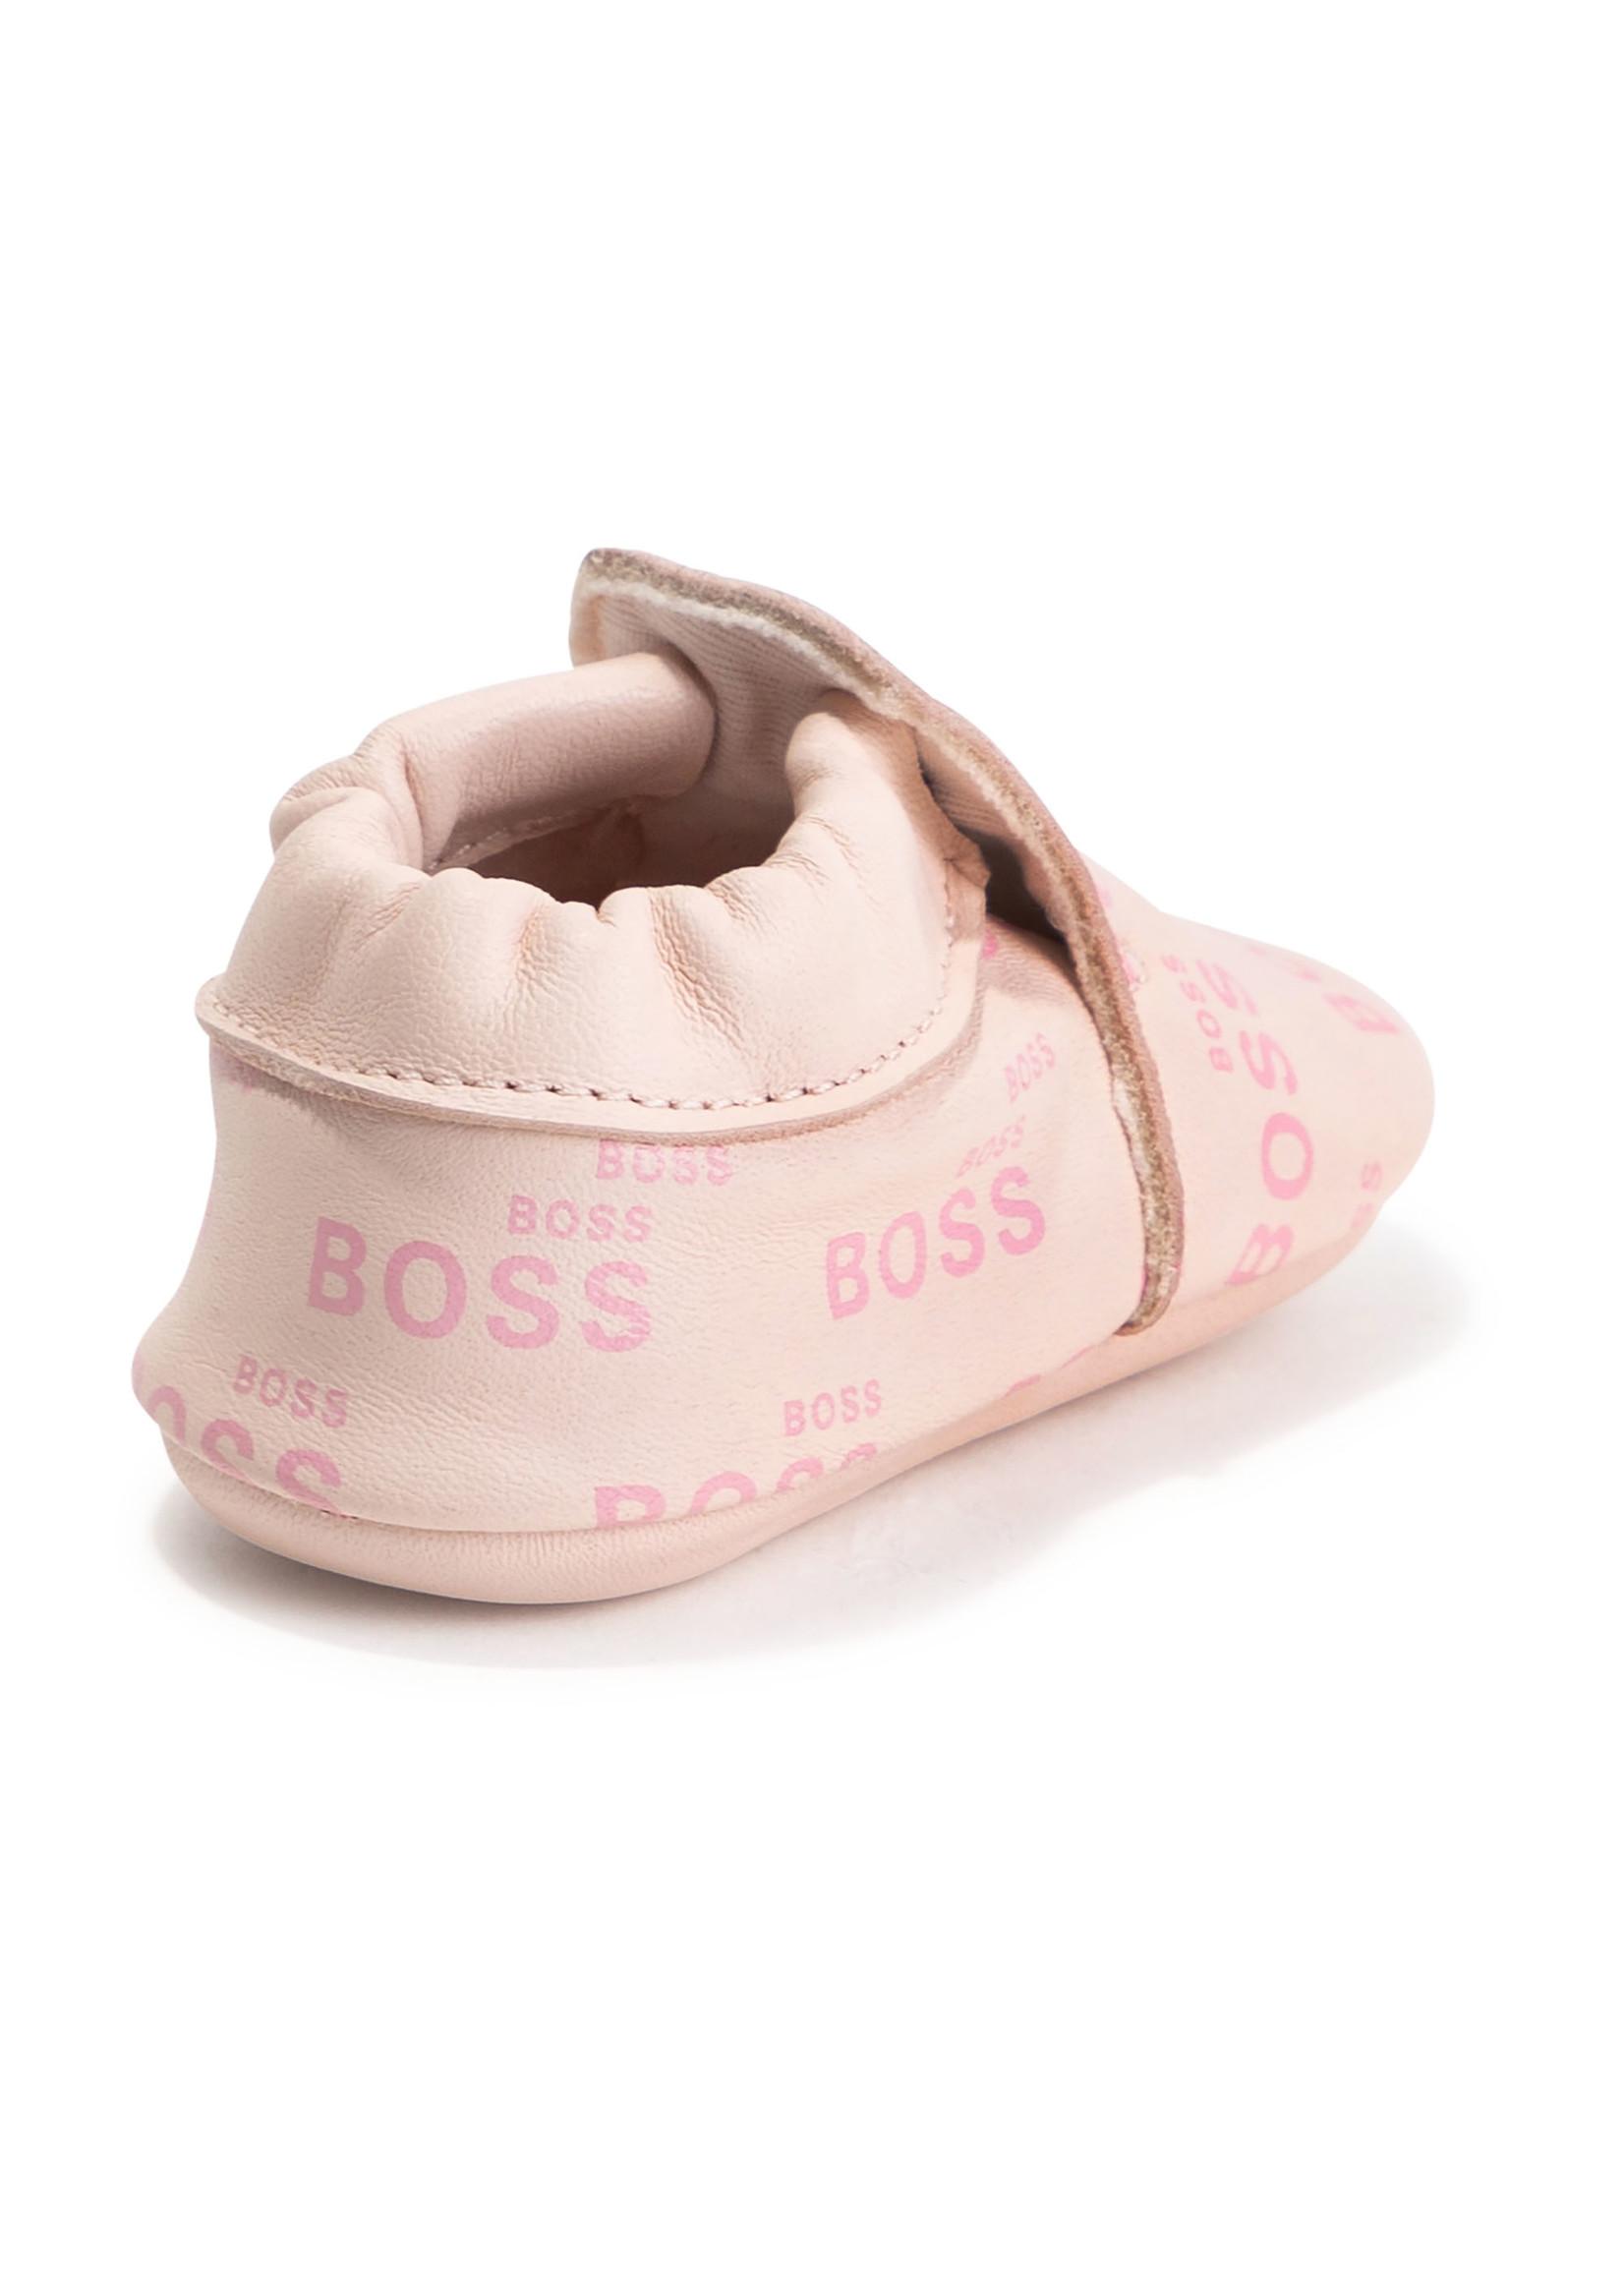 "HUGO BOSS HUGO BOSS Schoentjes ""Boss"" roze"